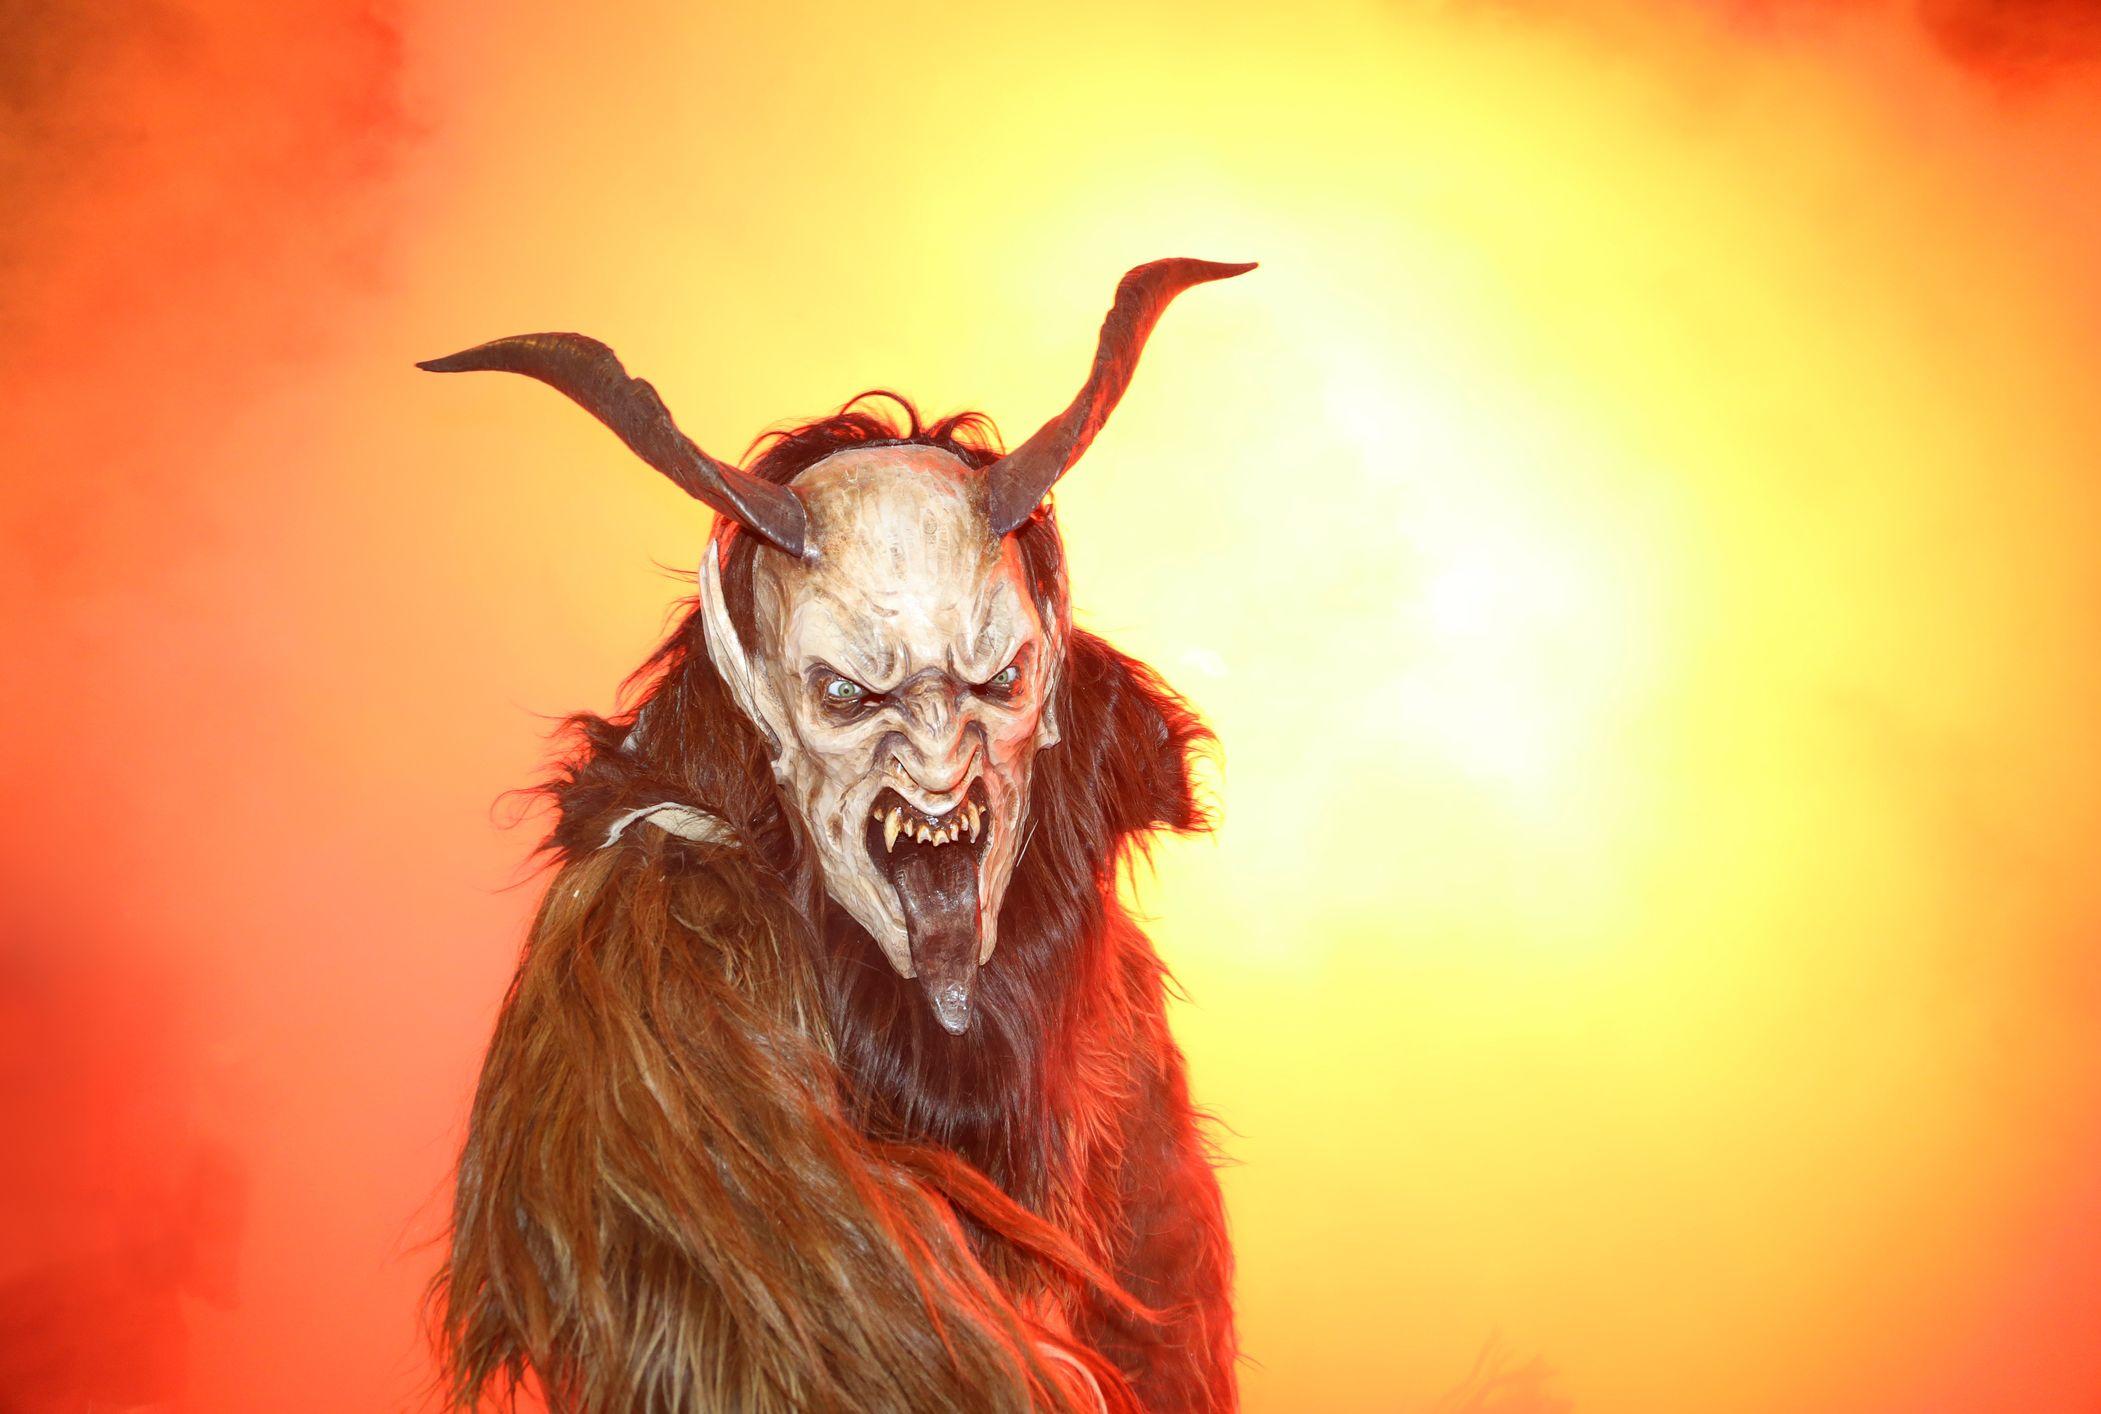 9 Facts About Krampus, St  Nick's Demonic Companion | Mental Floss